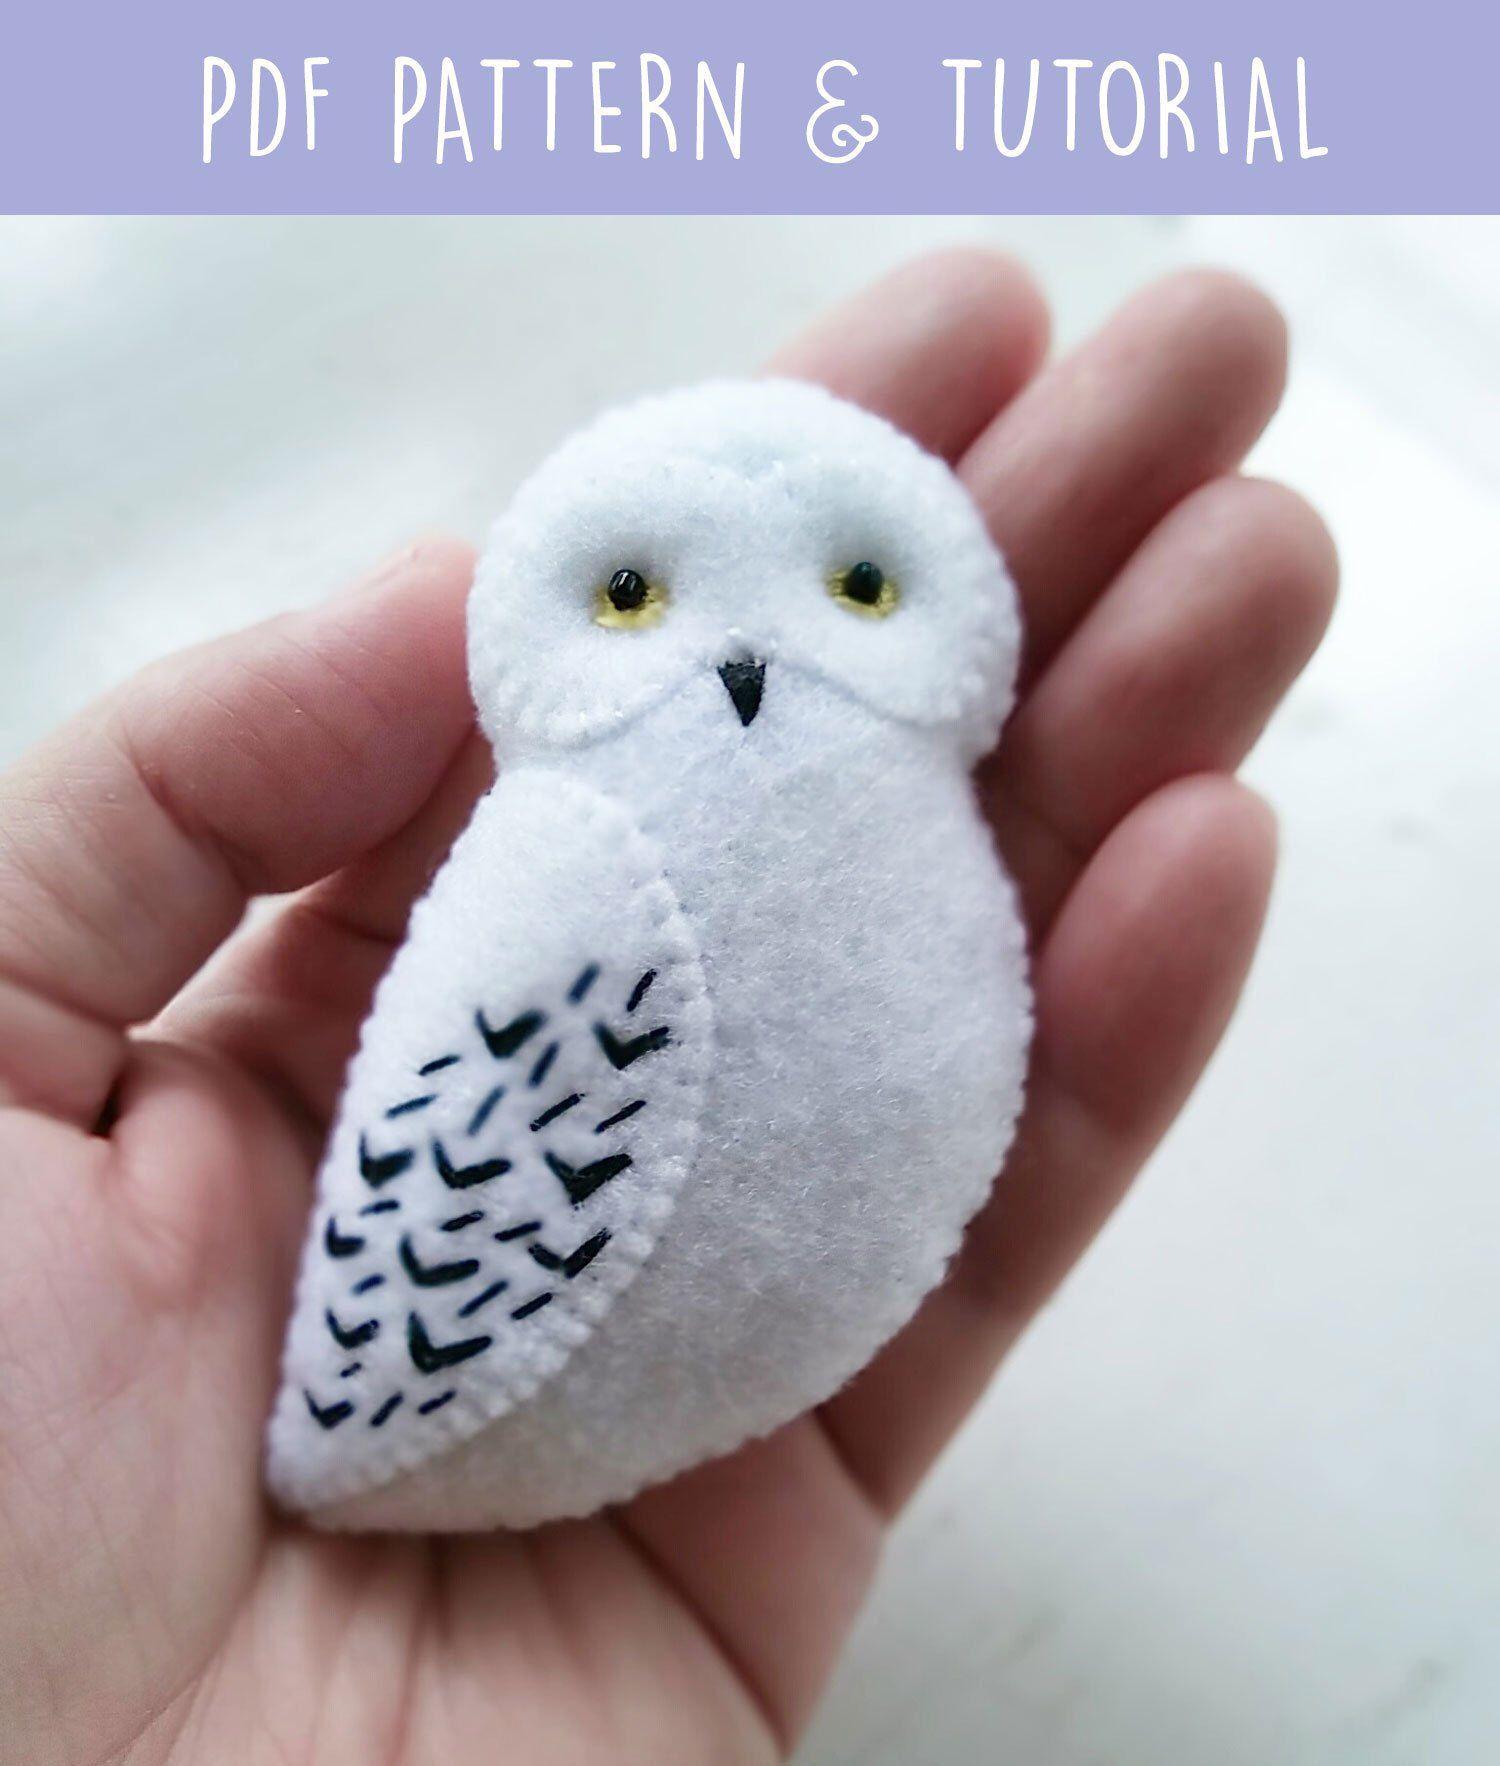 Pdf Pattern Of White Snowy Owl Felt Brooch Ornament Soft Toy Easy Craft For Children Diy Hedwig Harry Potter Owl Jewelry Felt Owls Harry Potter Owl Felt Crafts